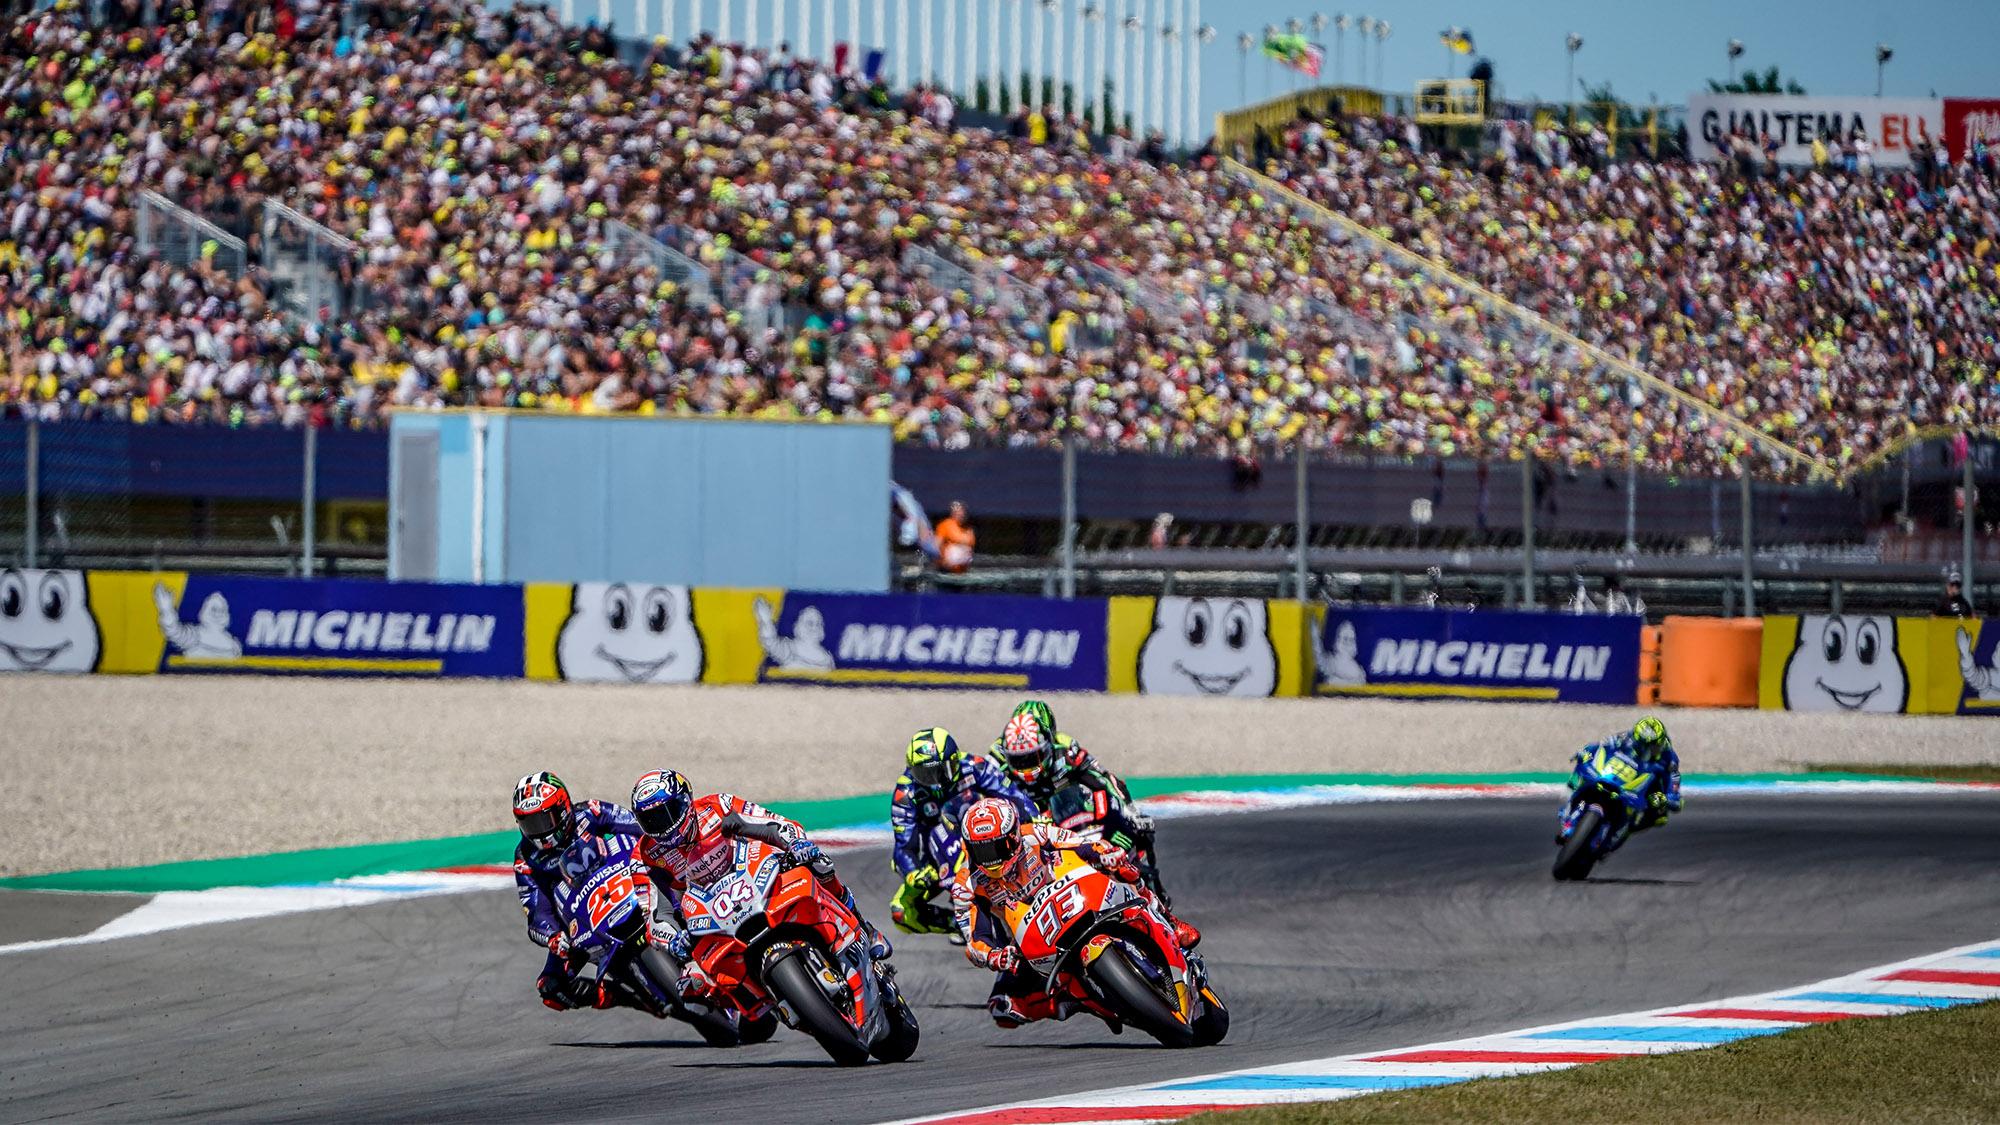 MotoGP, Assen 2018